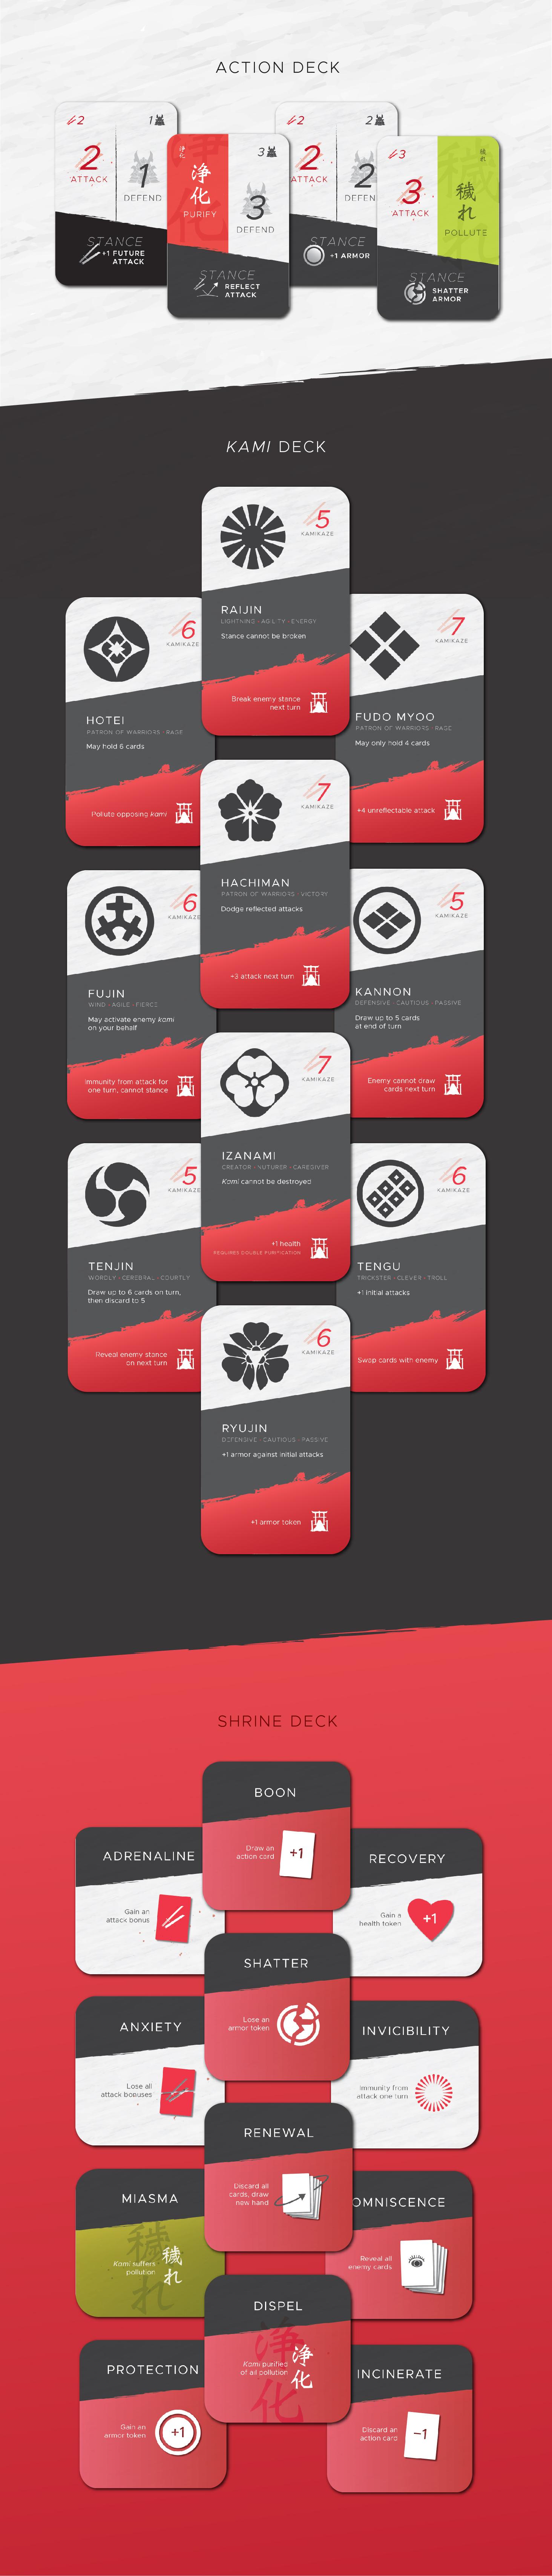 KickstarterPanels_Credits_Cards.jpg